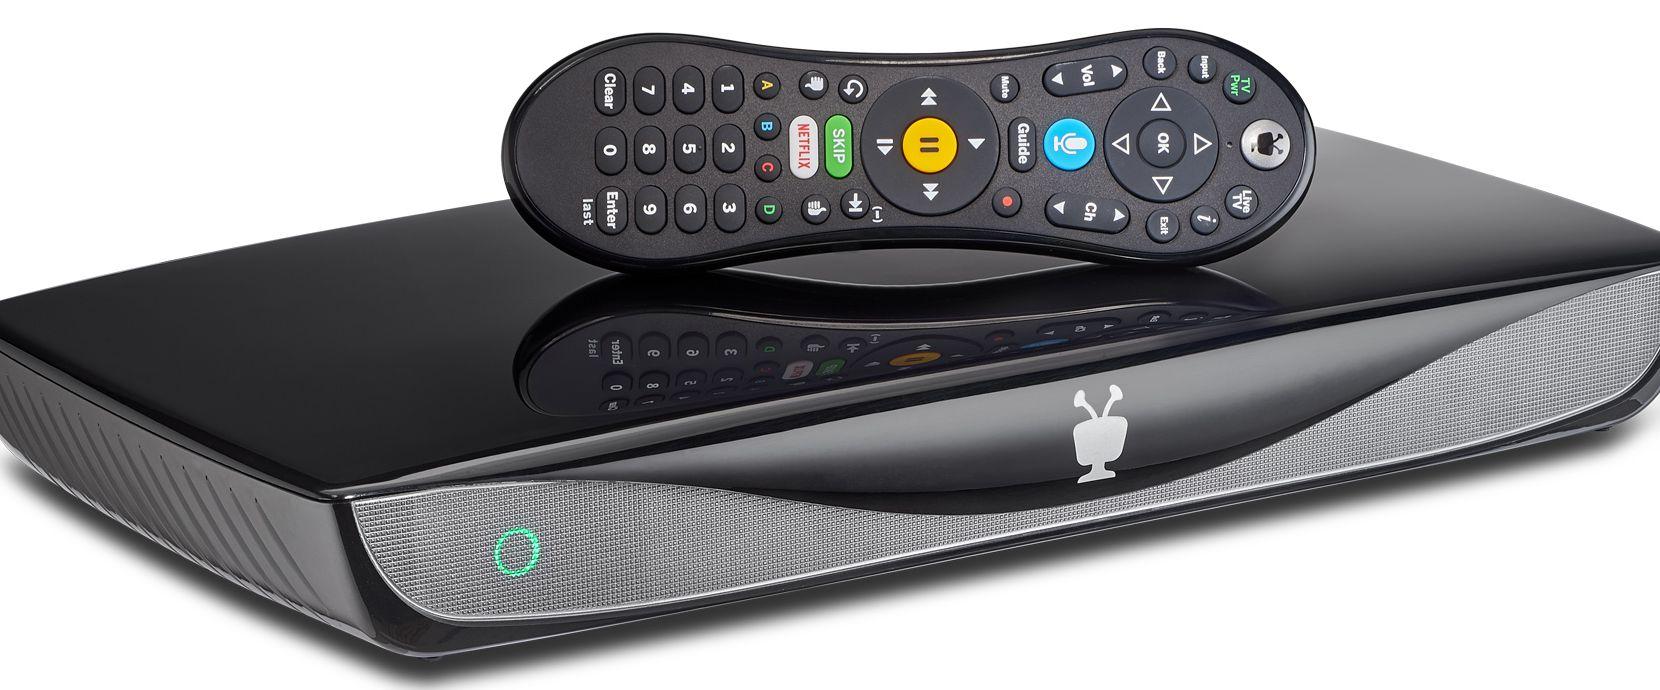 The TiVo Roamio OTA Vox